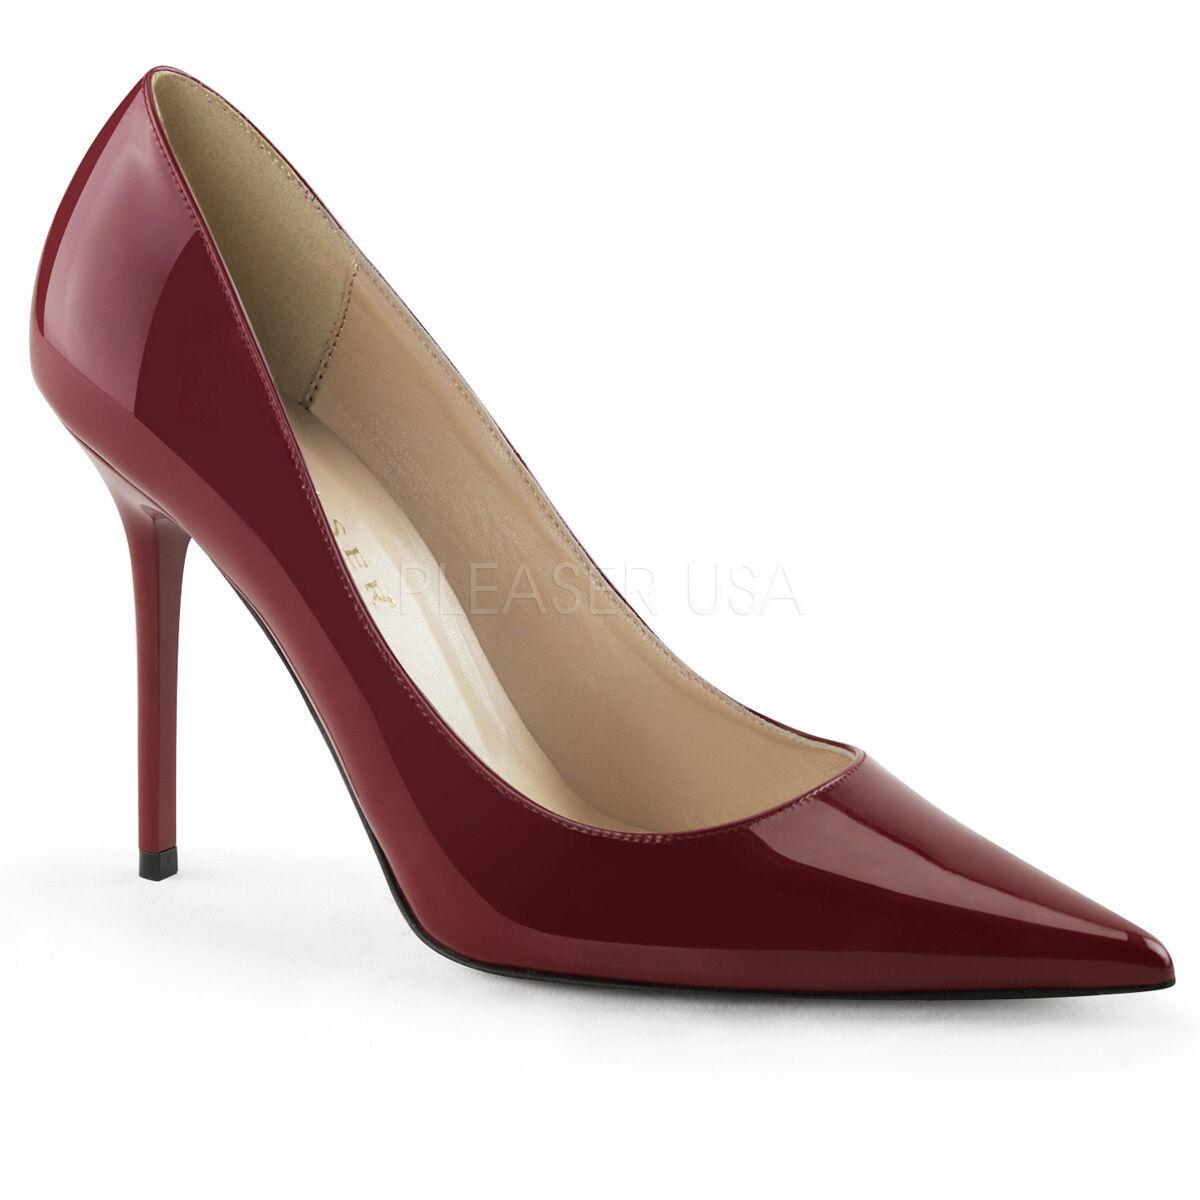 Classique-20 sexy elegante Damen Frauen High-Heels Pumps viele Farben Gr 35 - 47